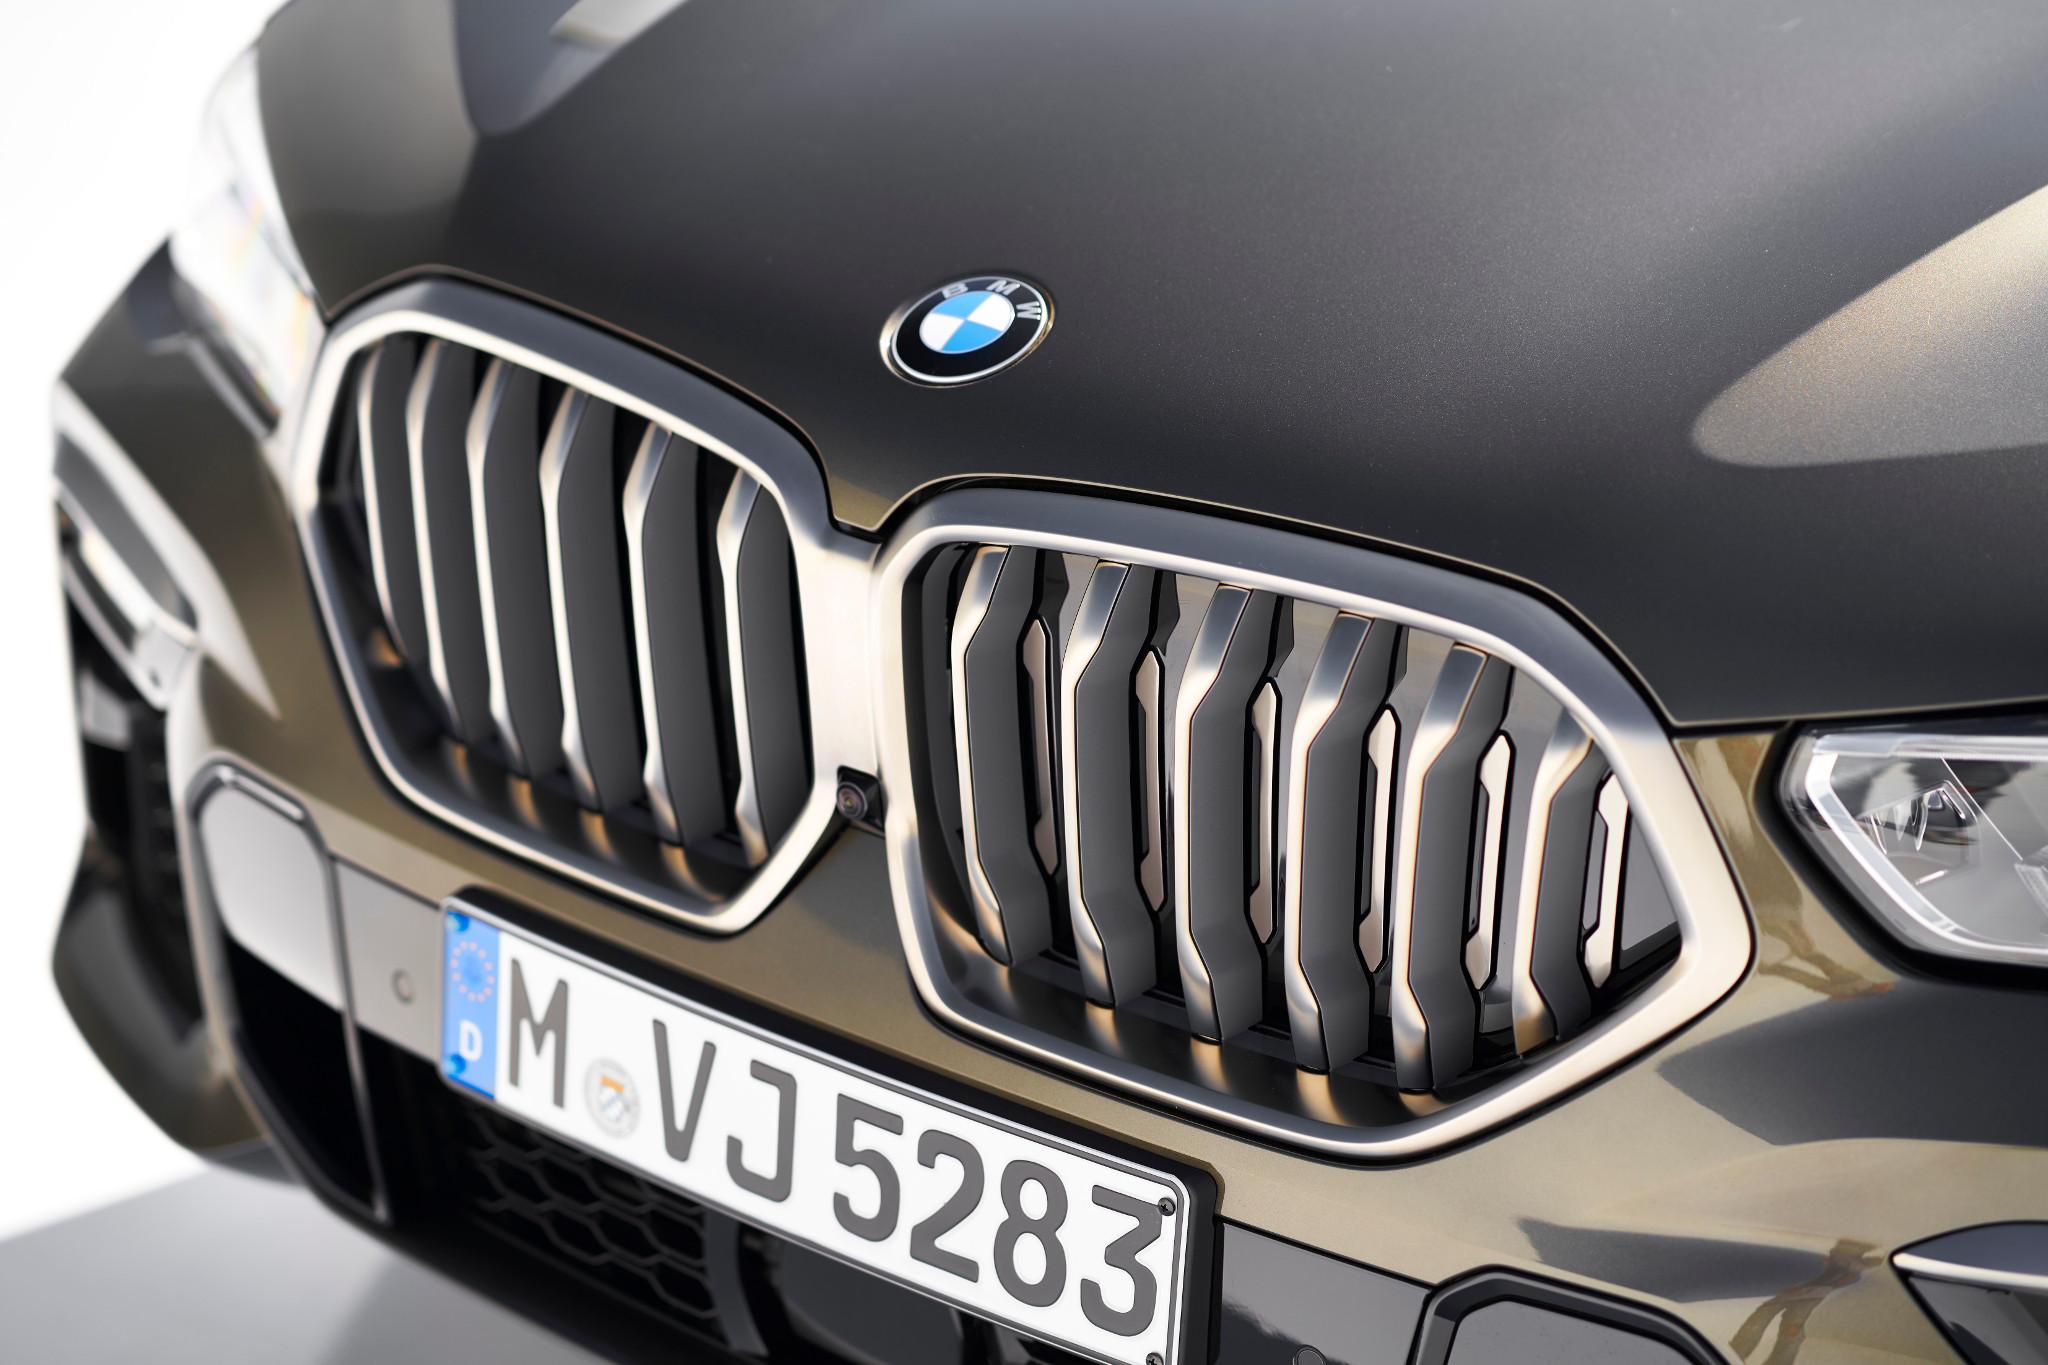 Redone 2020 Bmw X6 Coupe A Rakish Take On 2019 X5 Suv News